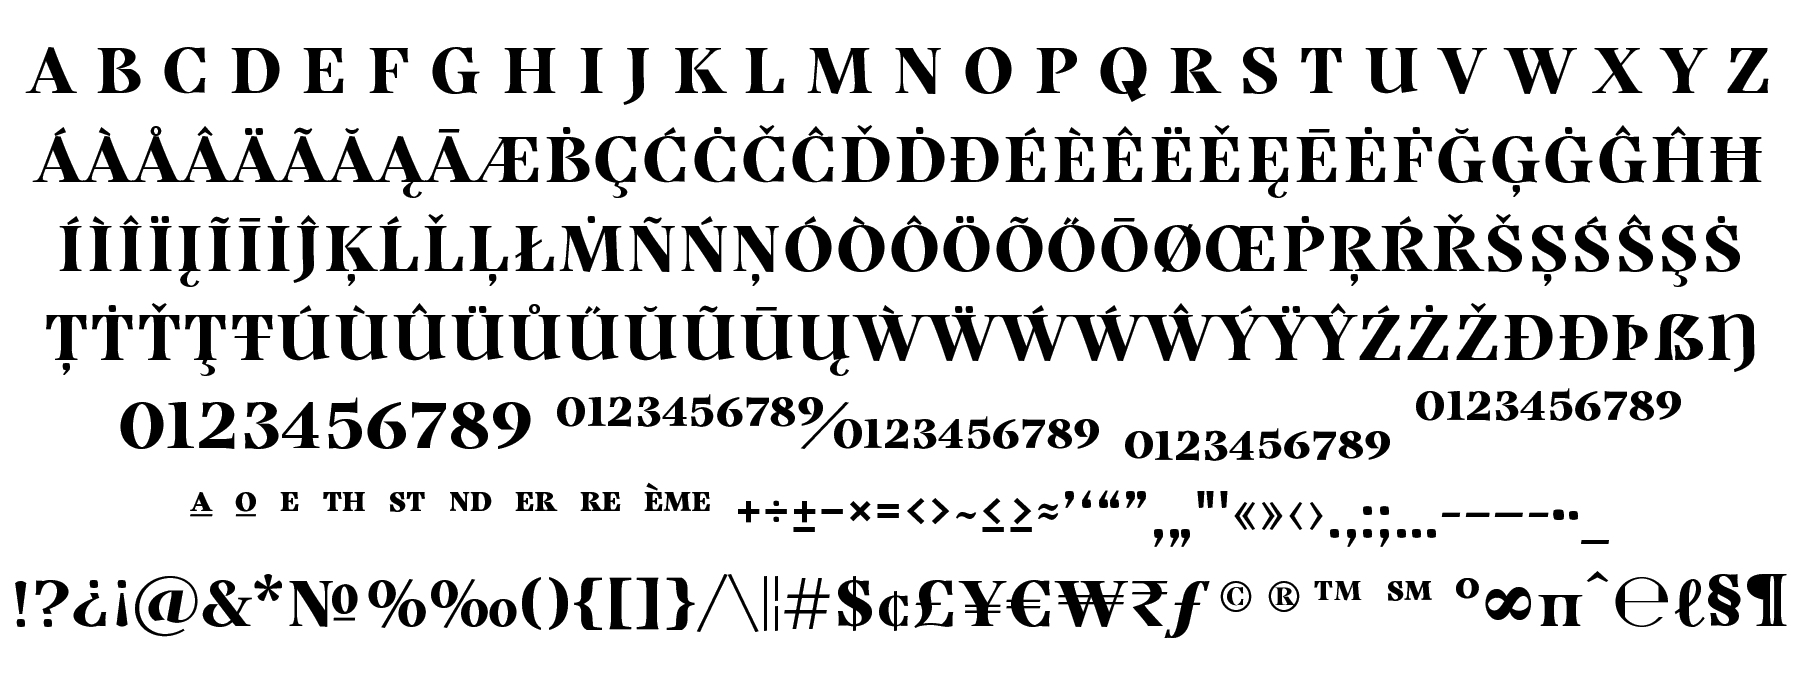 Grafton Base Character Set